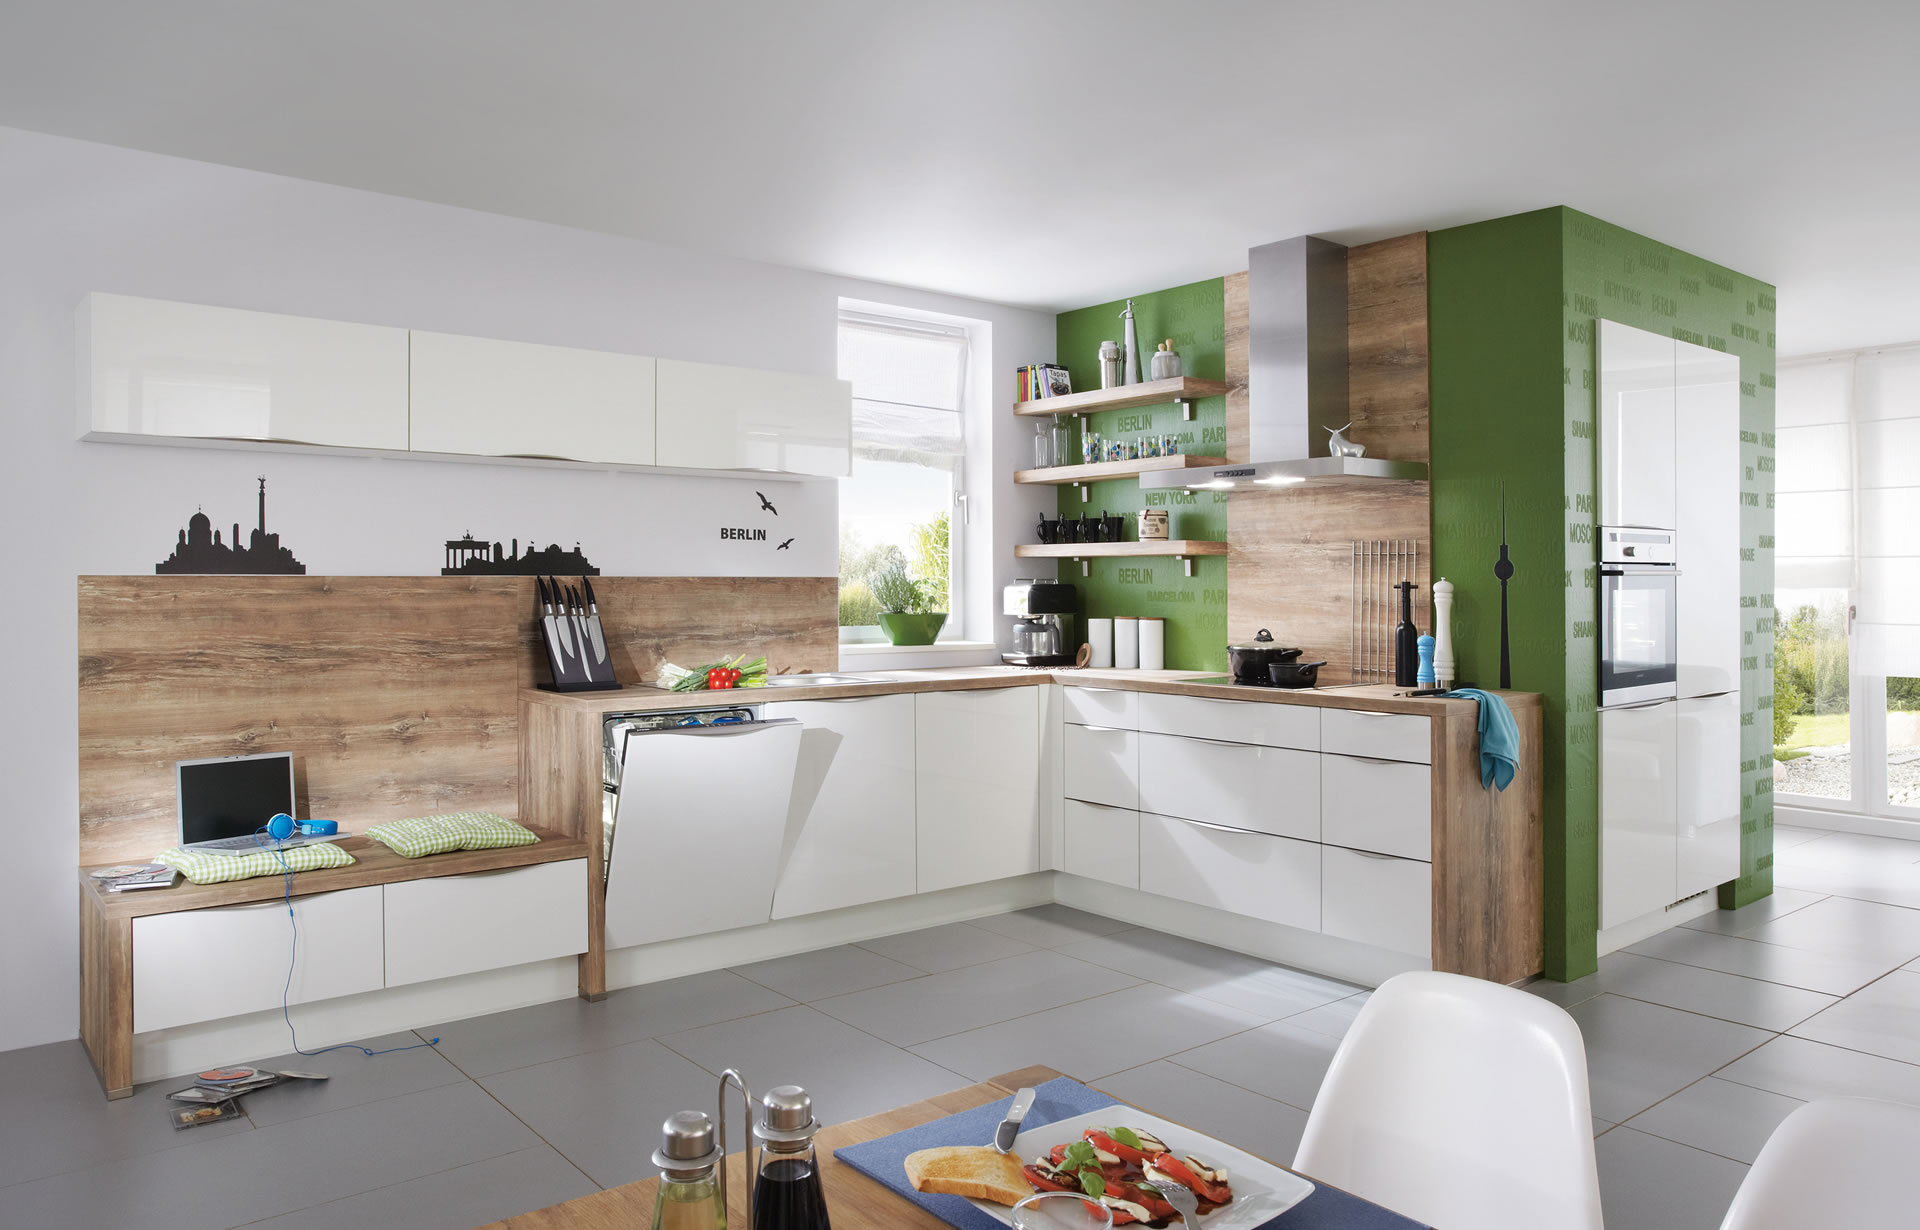 Awesome Preisliste Nobilia Küchen Ideas - Ridgewayng.com ...